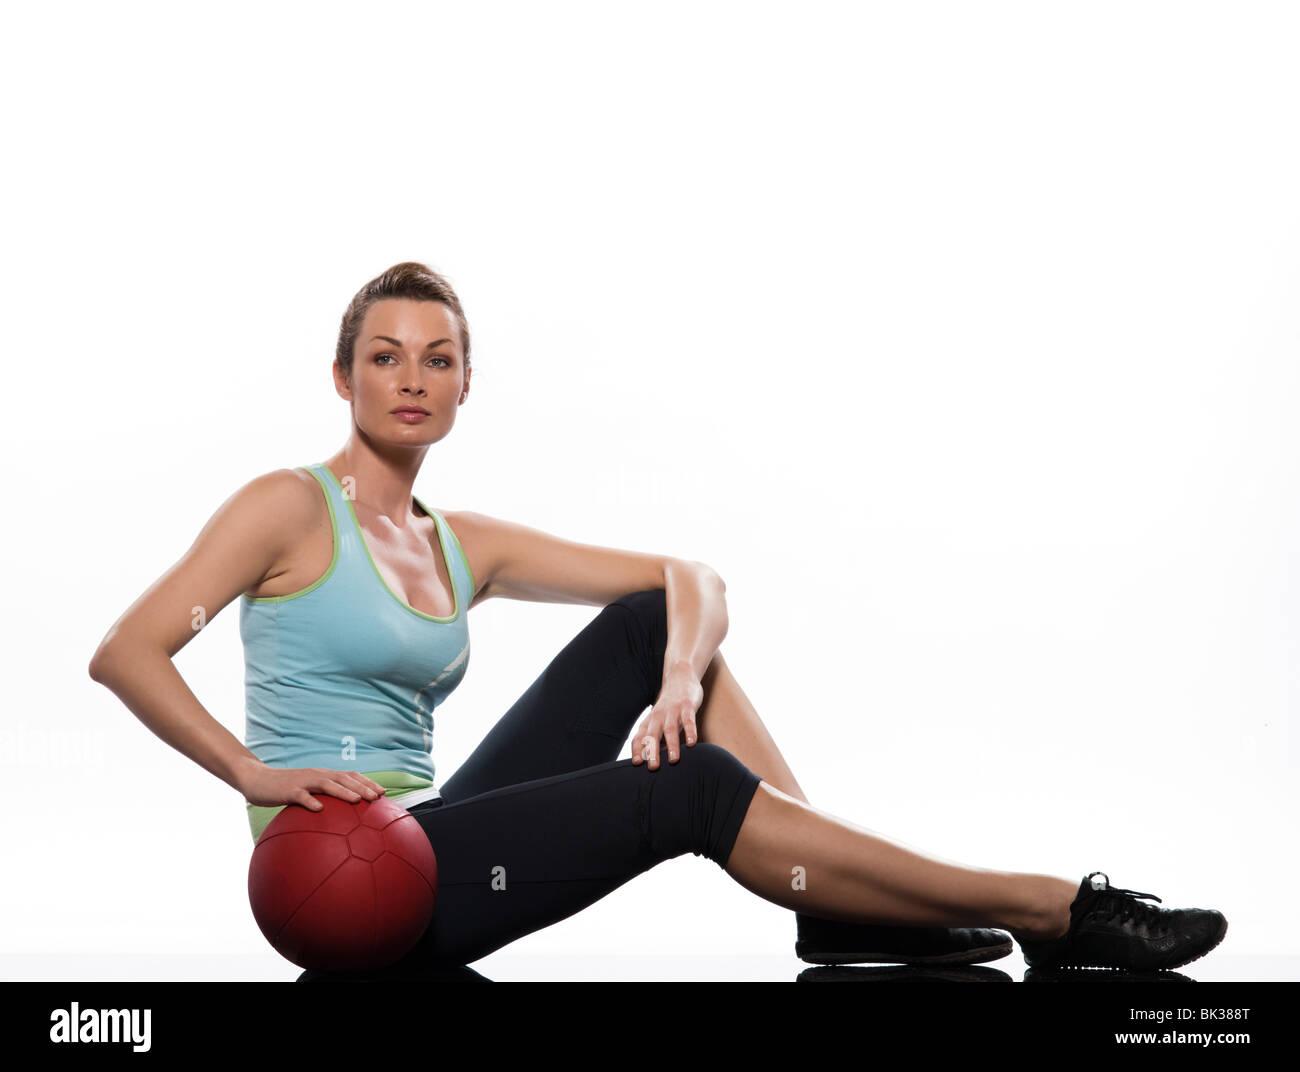 Mujer sosteniendo pelota fitness postura Worrkout ejercicio abdominales  entrenar la postura sobre fondo blanco aisladas Imagen 80ebc1351efb